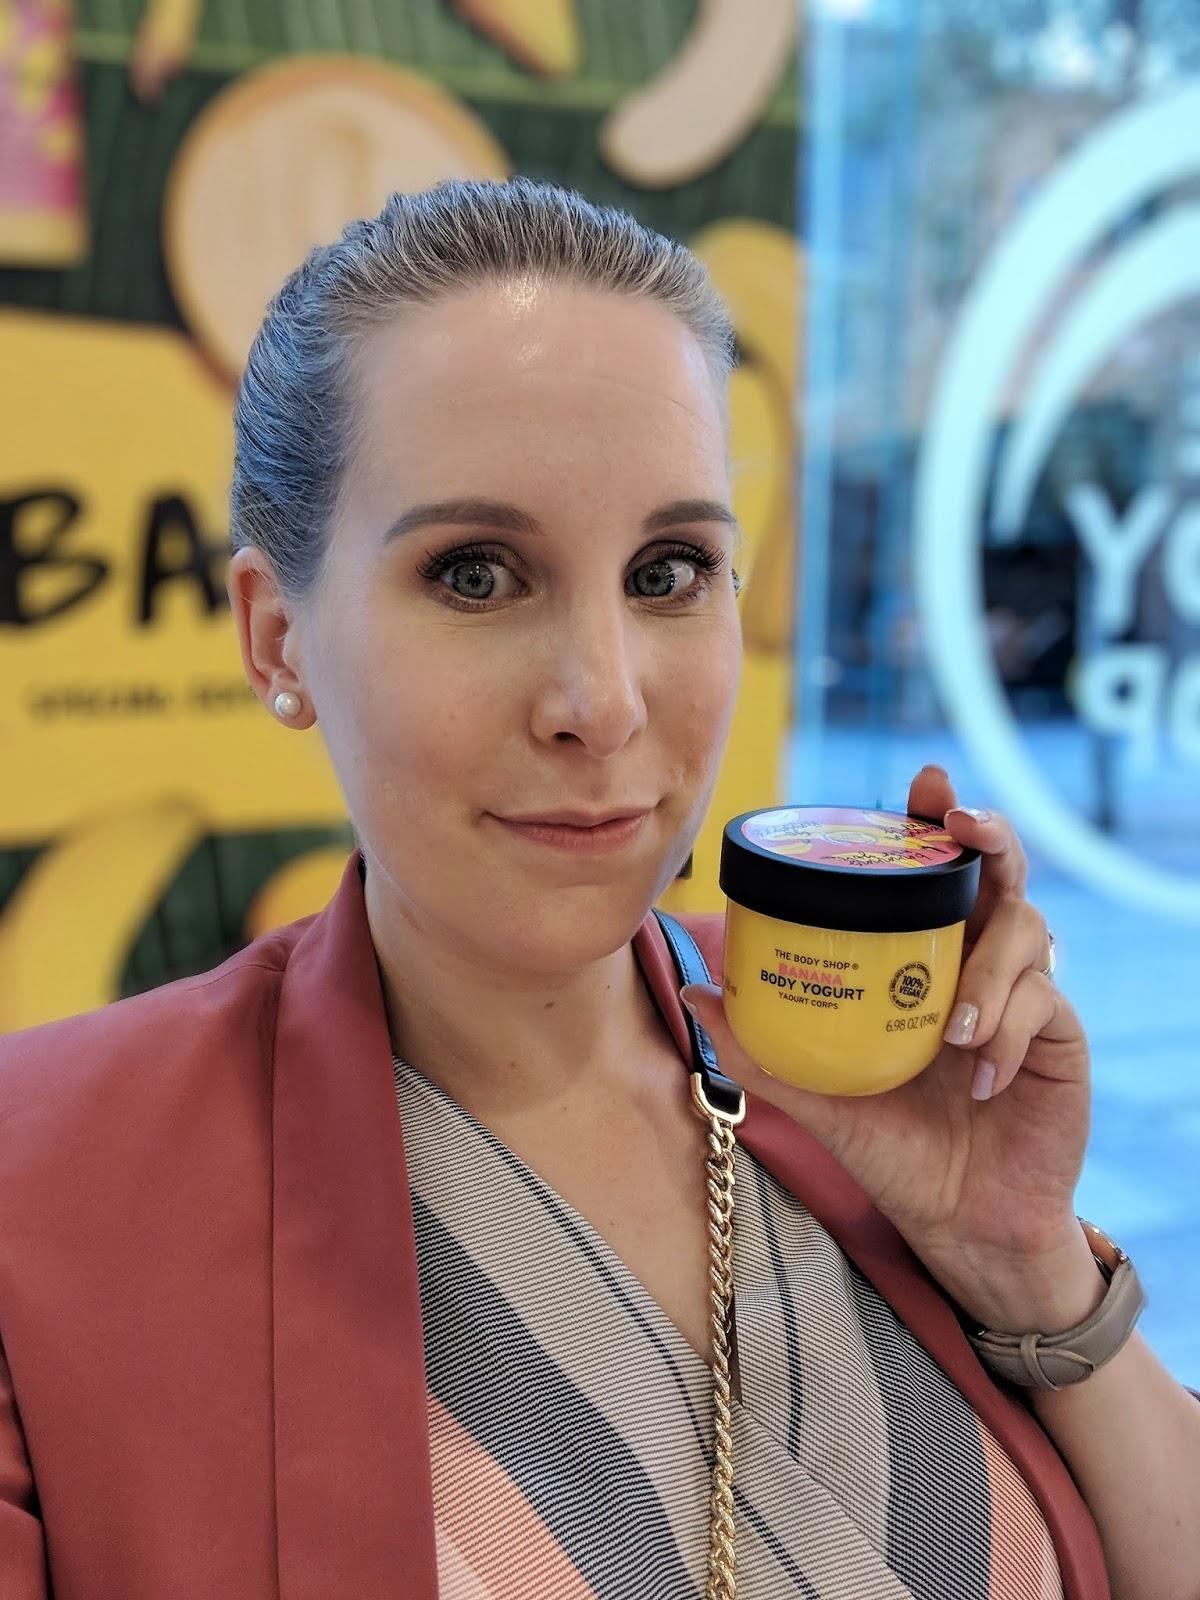 The_Body_Shop_Banana_Body_Yogurt_Selfie